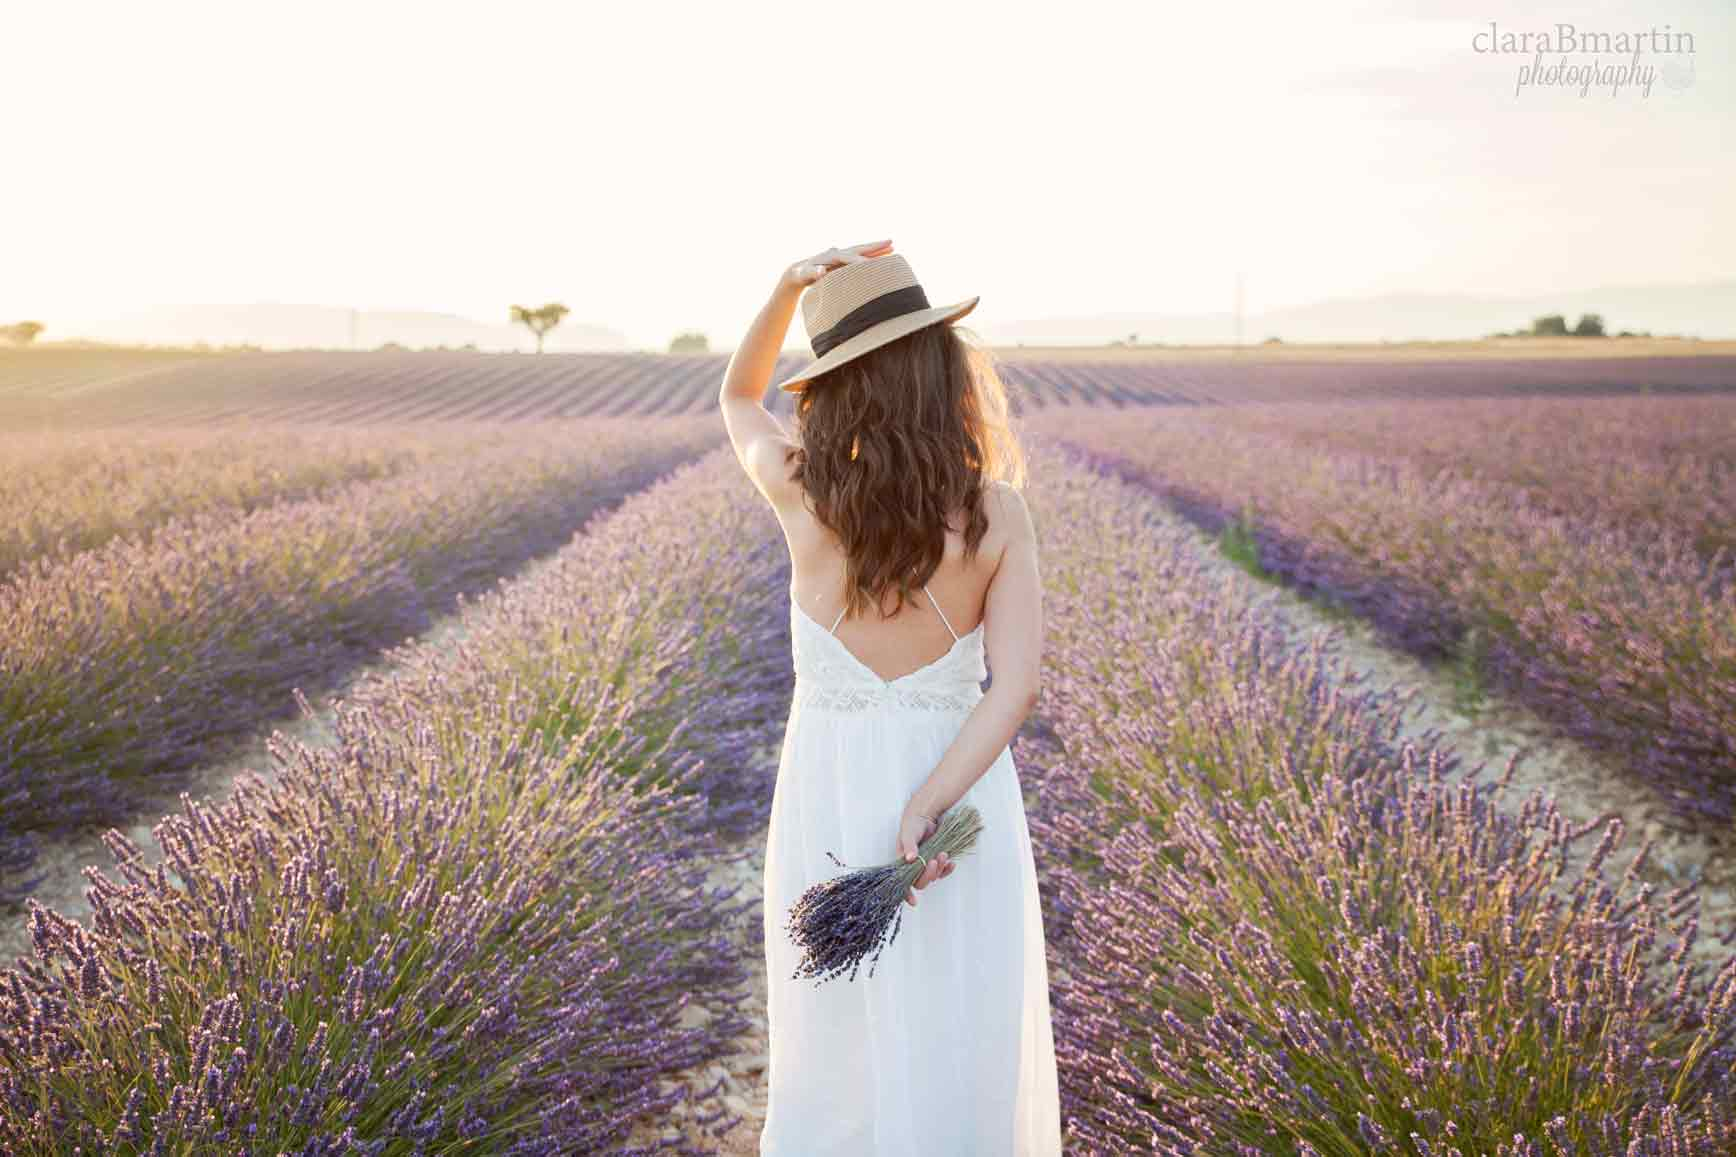 Lavender-fields-Provence-claraBmartin07